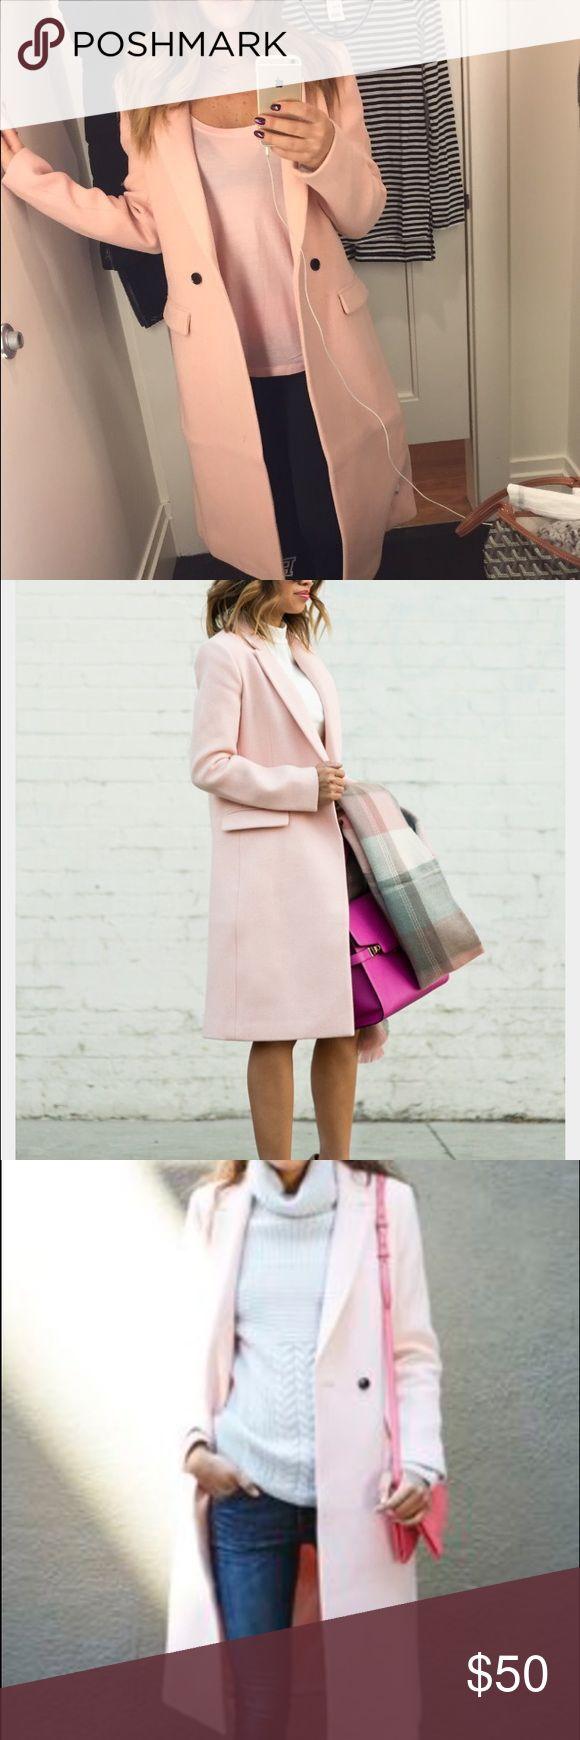 Banana Republic Pink Wool Coat Beautiful blush colored wool coat from Banana Republic winter 2016. Warm but not heavy, great piece for photos and layering. 2 pockets, back bent. Size XS. Banana Republic Jackets & Coats Pea Coats